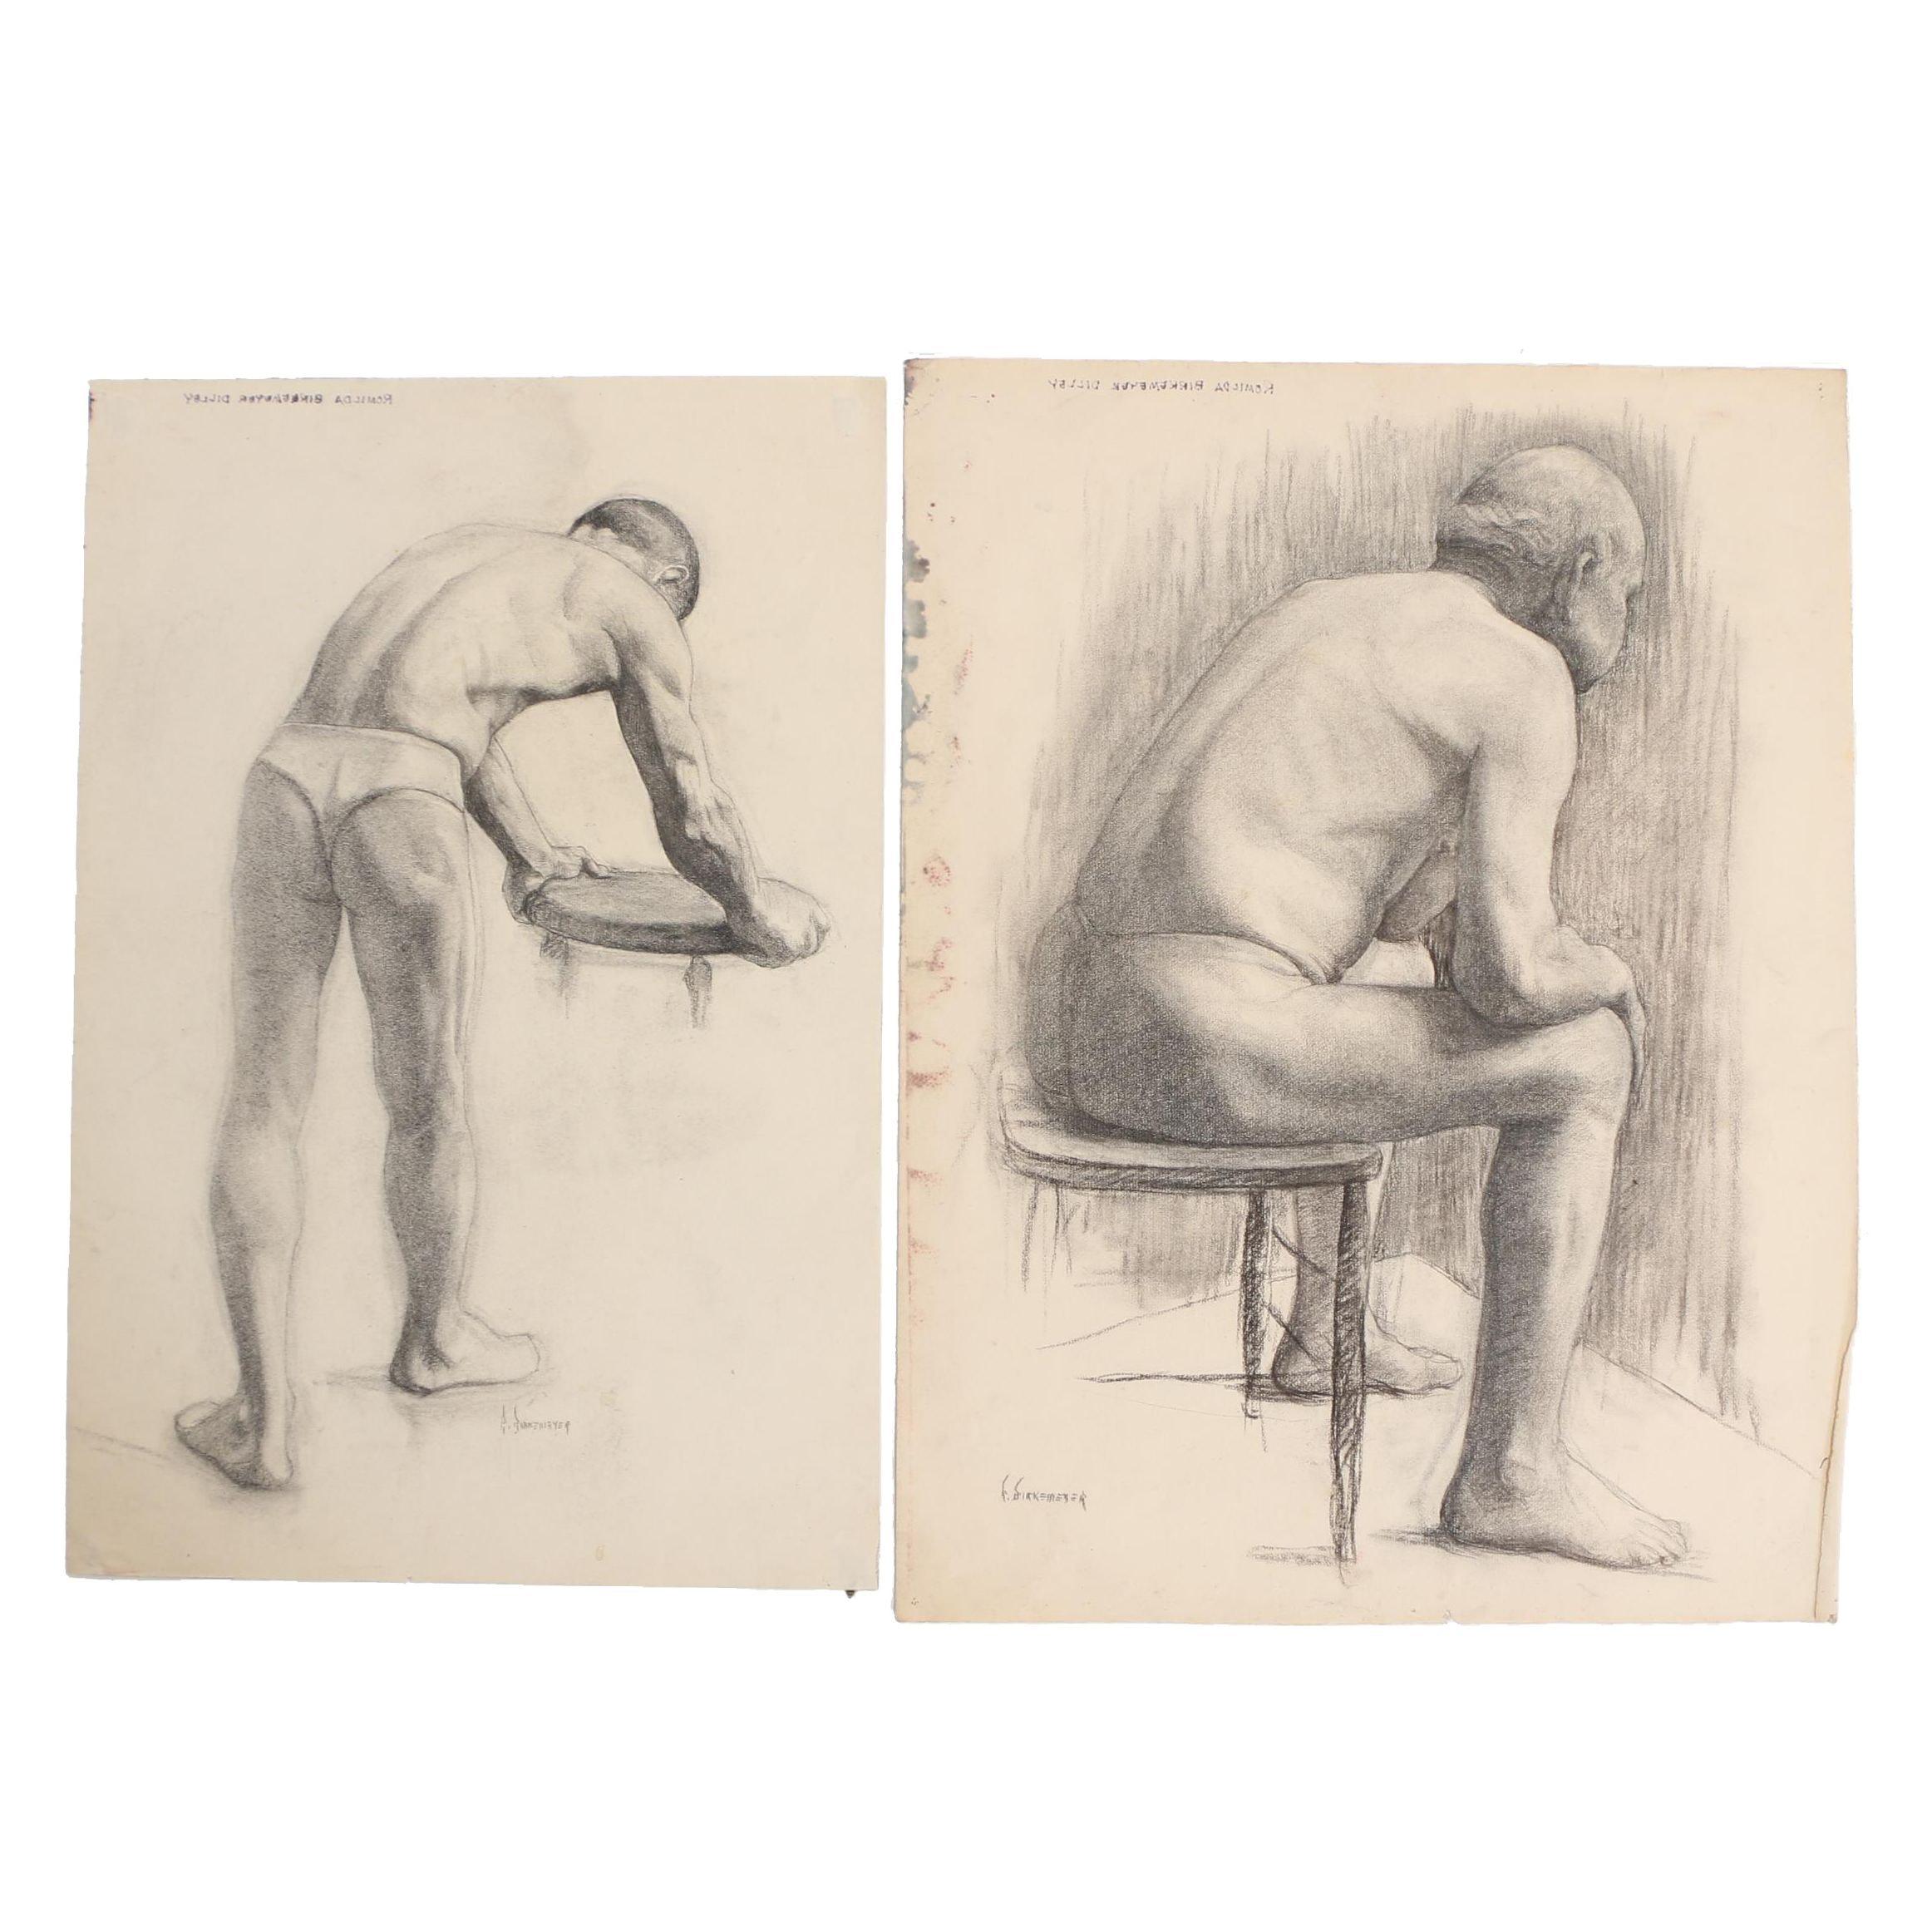 Romilda Birkemeyer Dilley Charcoal Drawings of Male Figural Studies